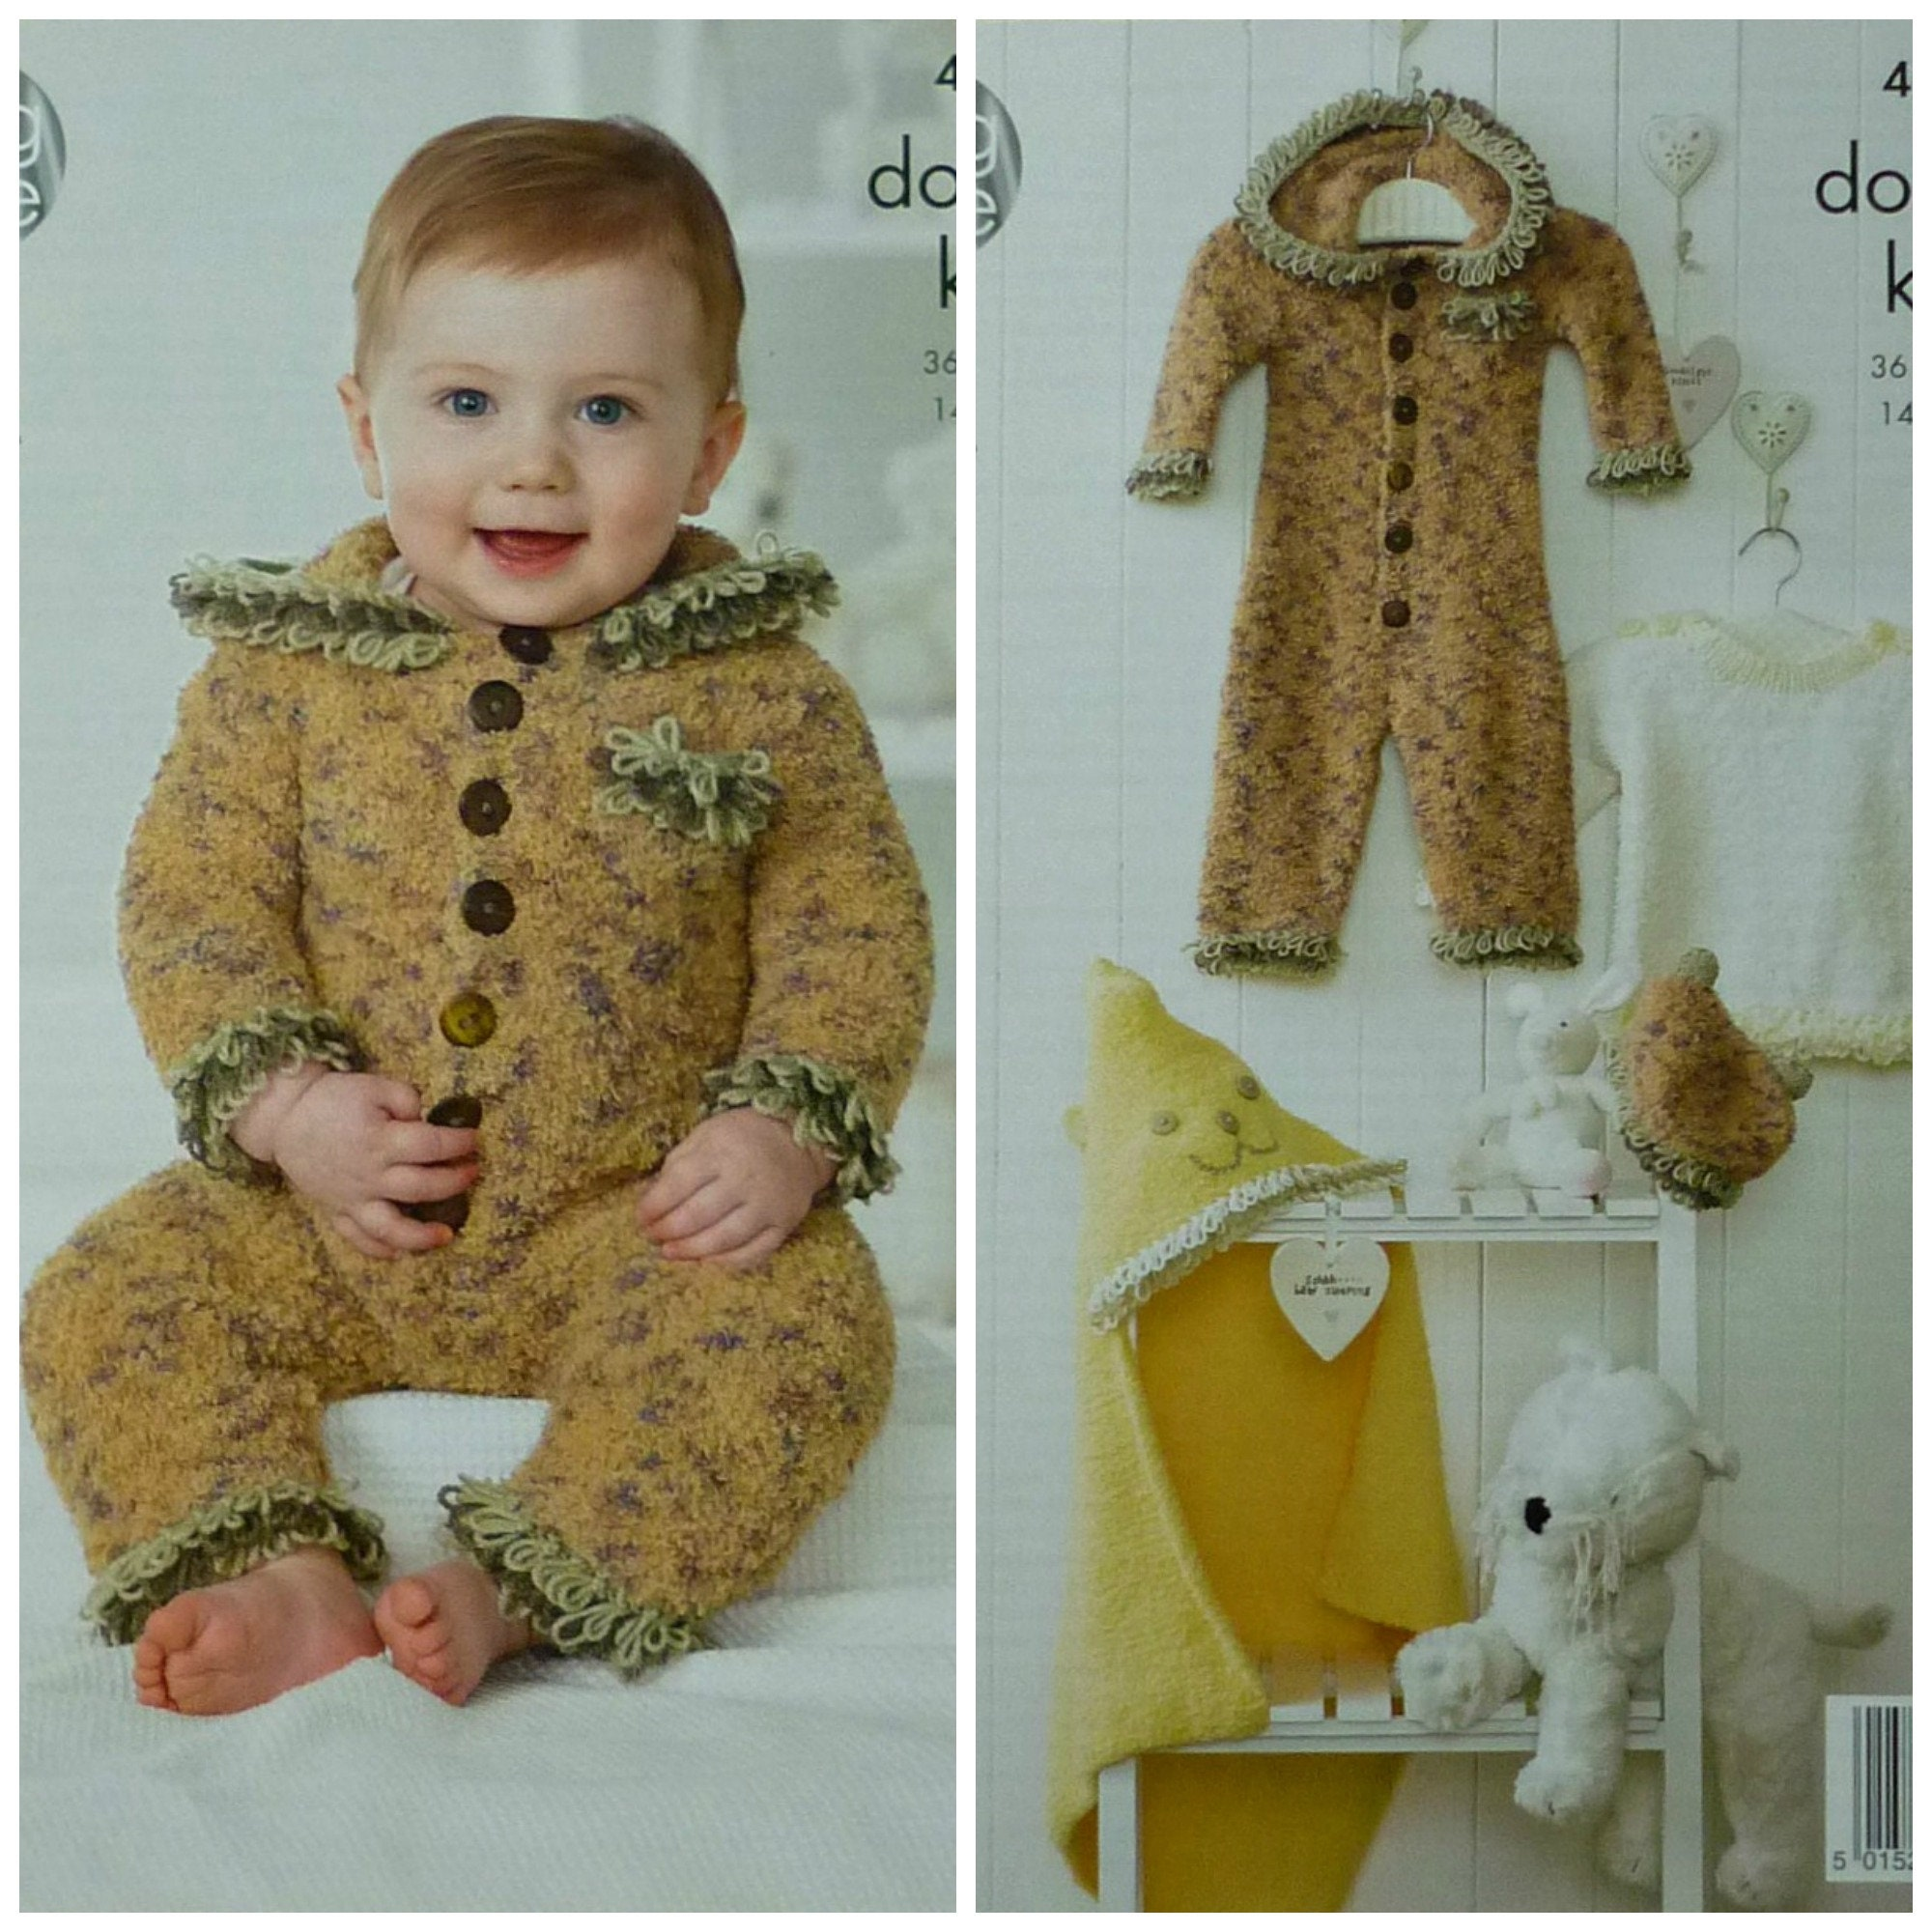 Baby Clothes Set Knitting Pattern King Cole Cuddles DK Dress Coat Waistcoat 4230